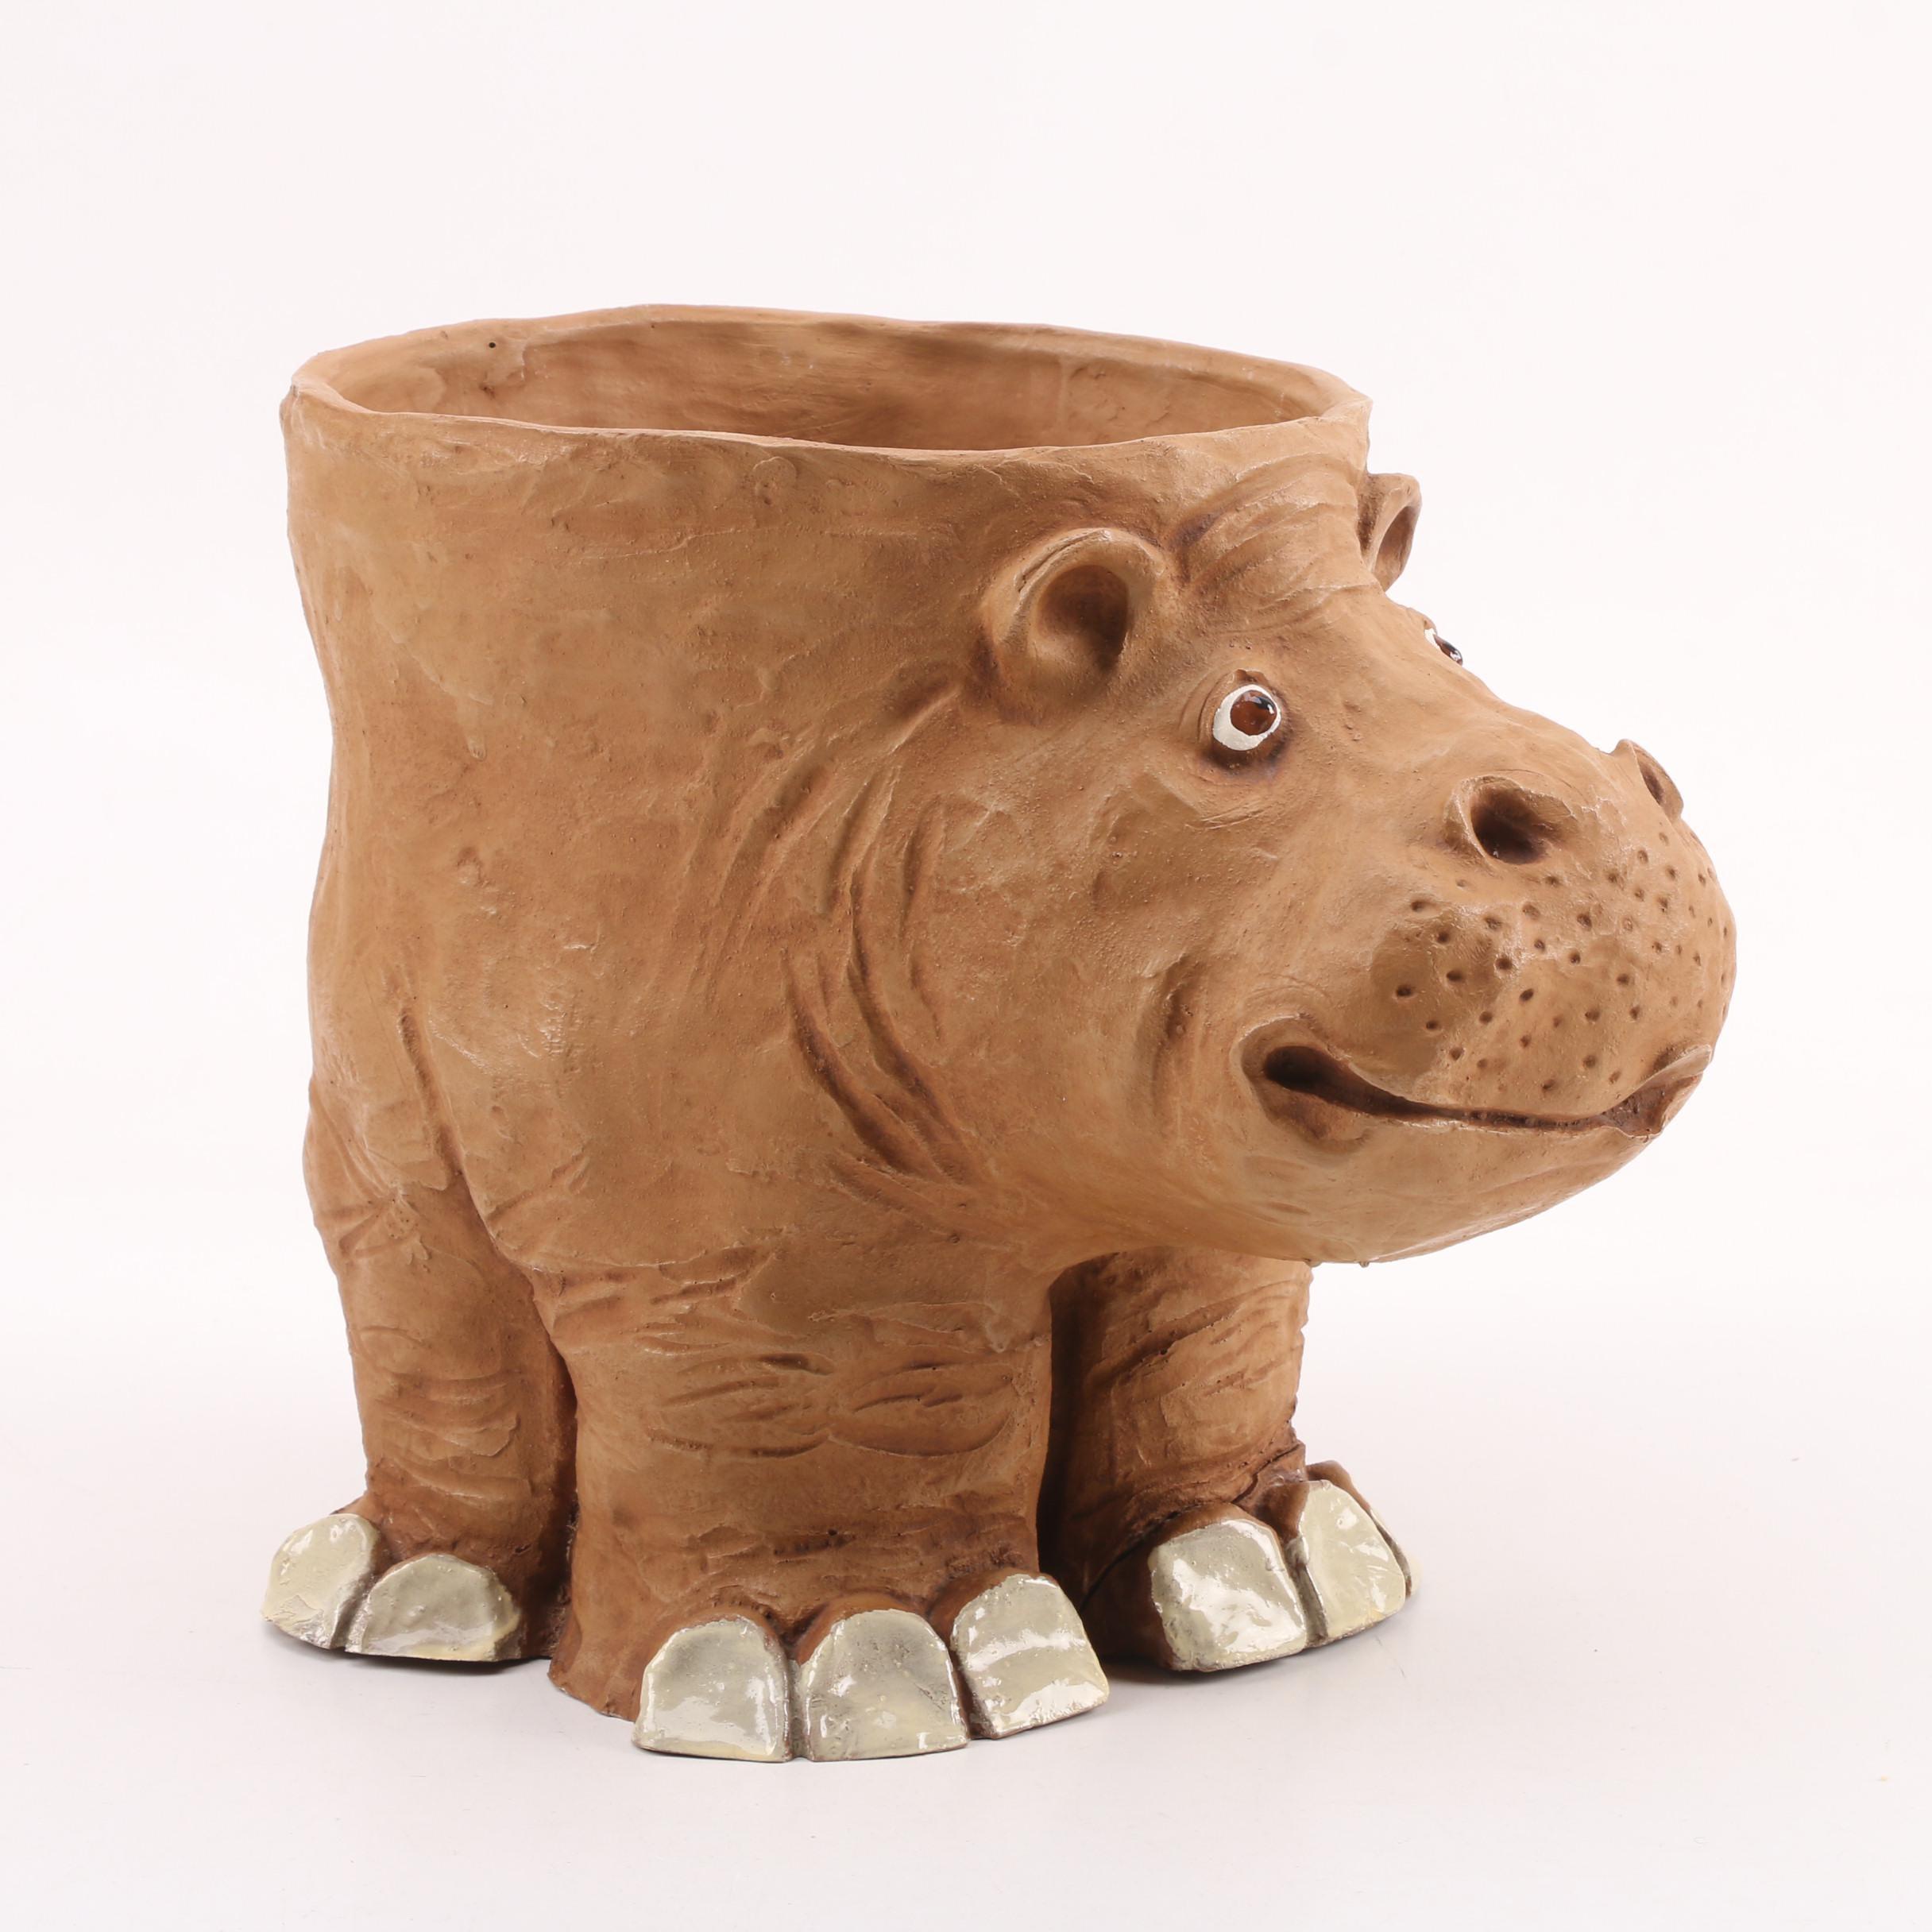 Dave Grossman Designs Sculptural Clay Hippopotamus Planter